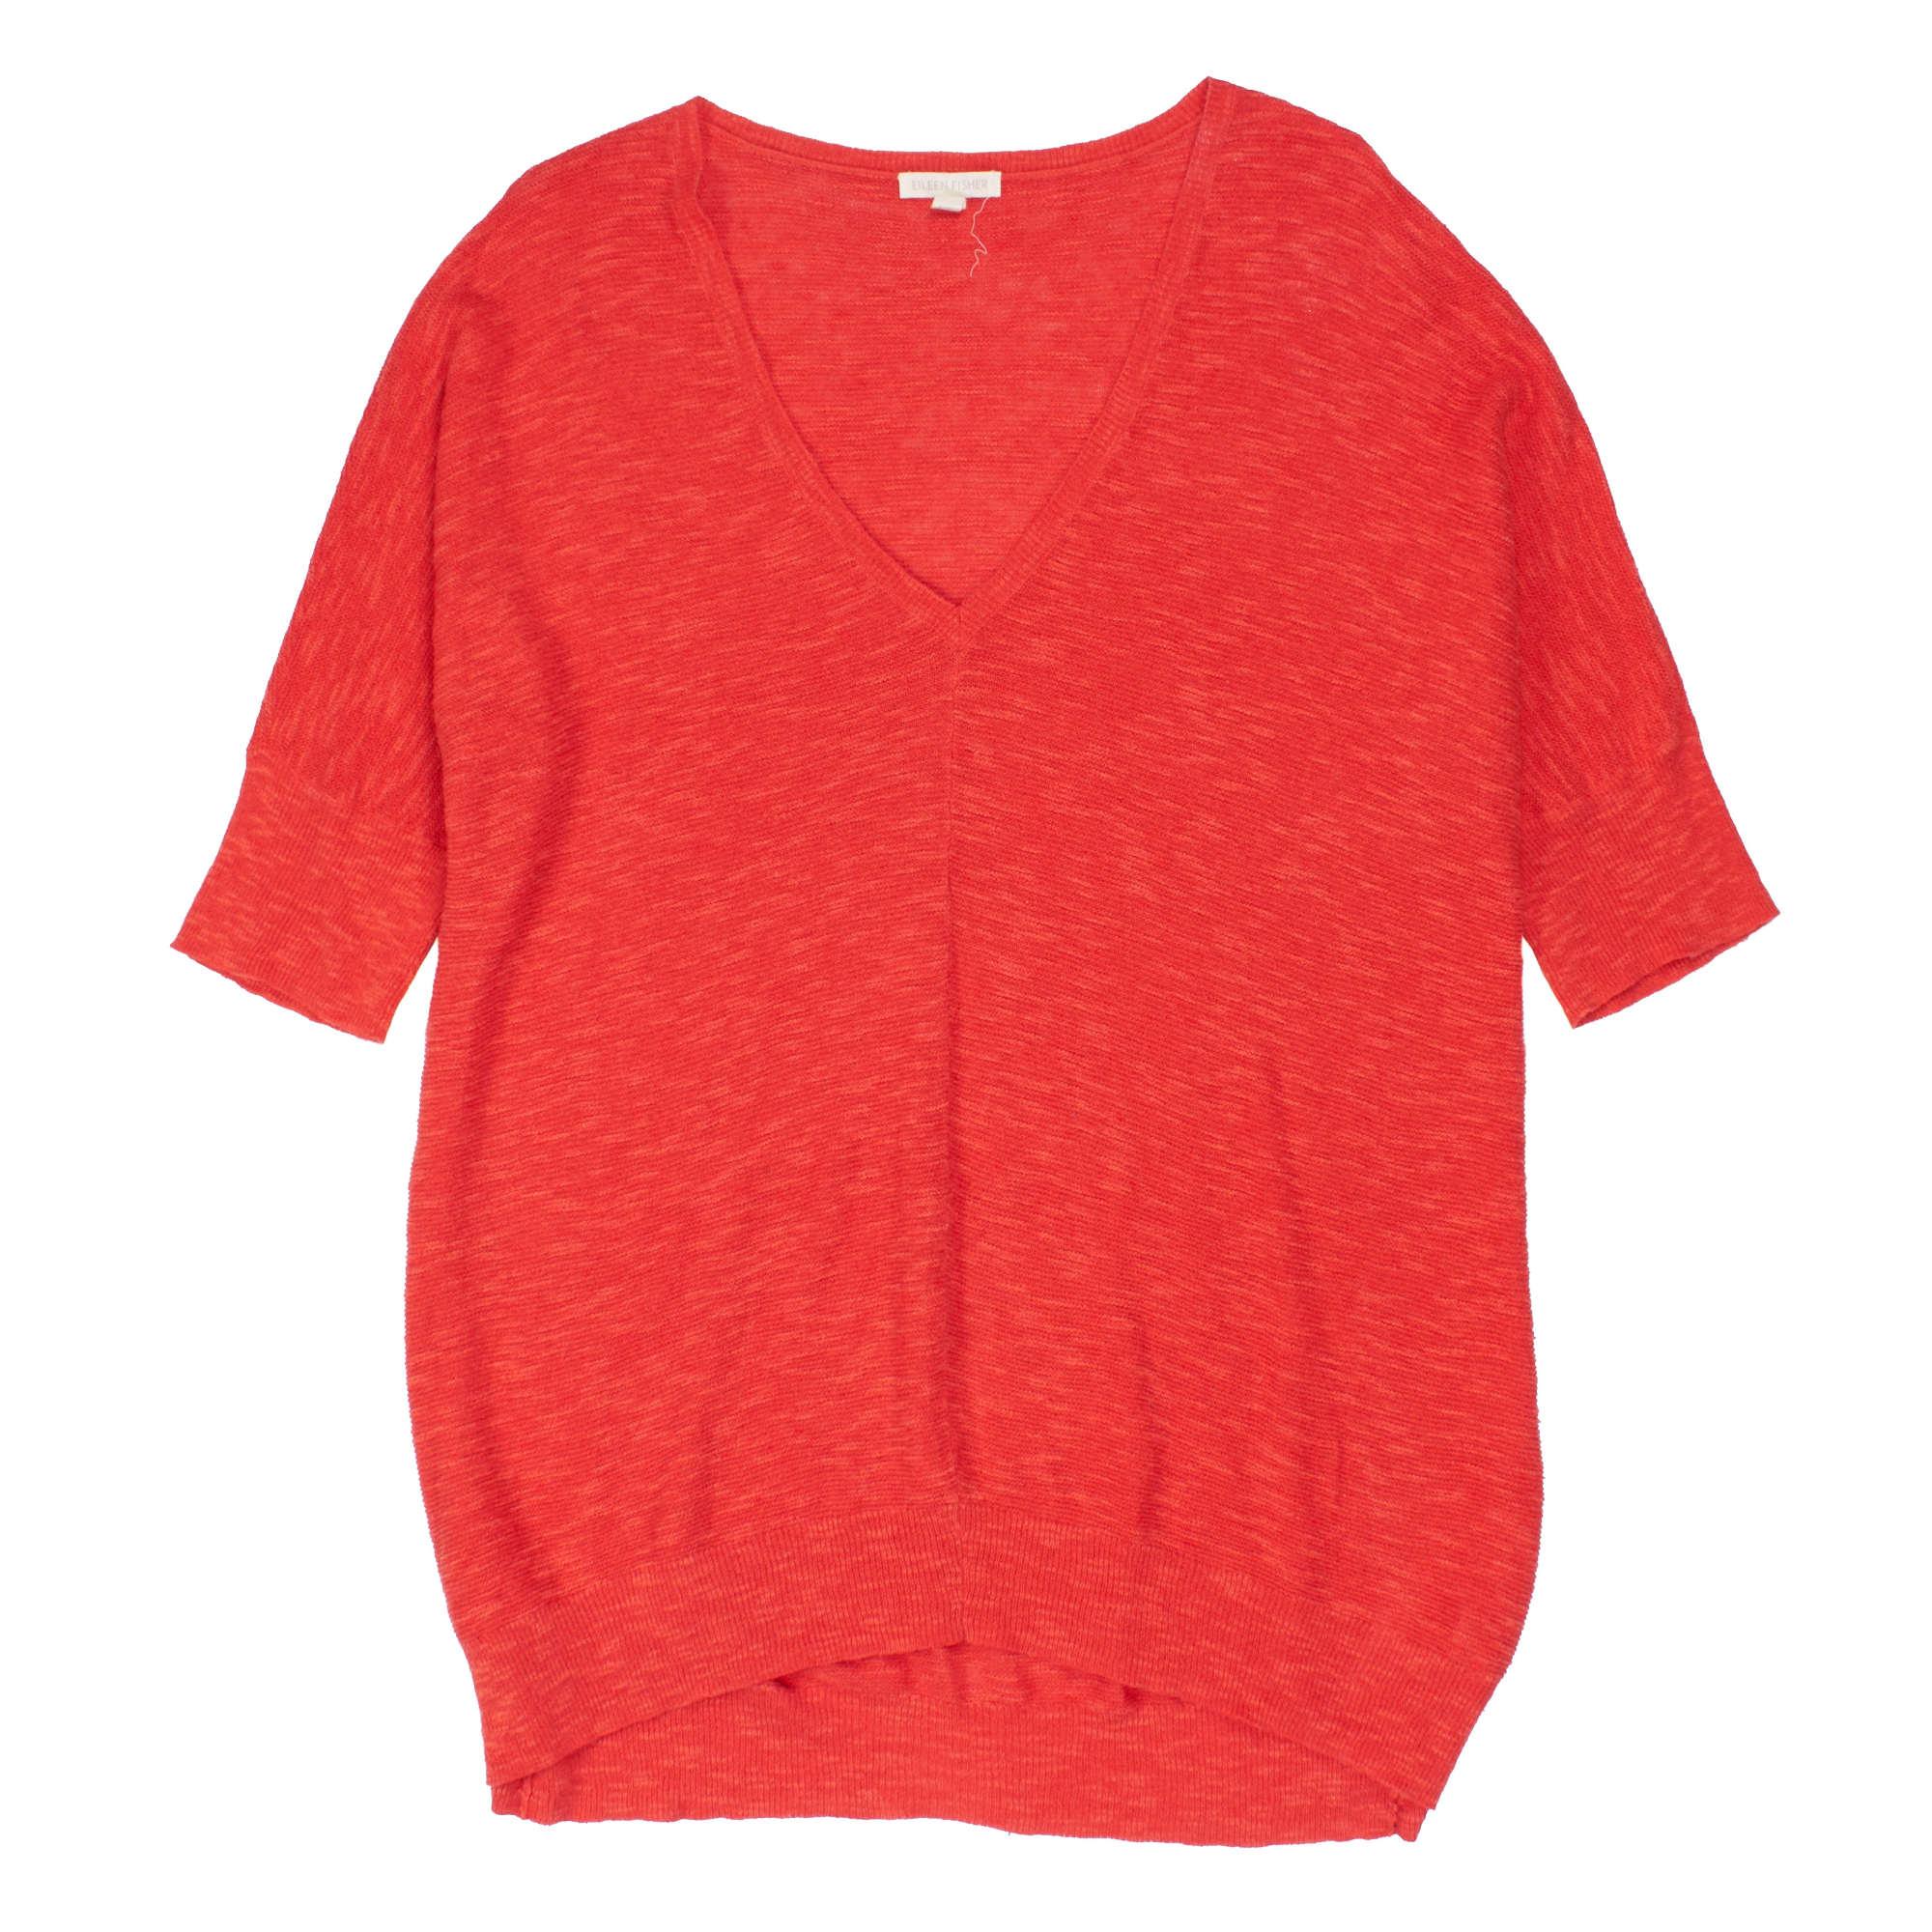 Organic Linen Cotton Slub Links Pullover